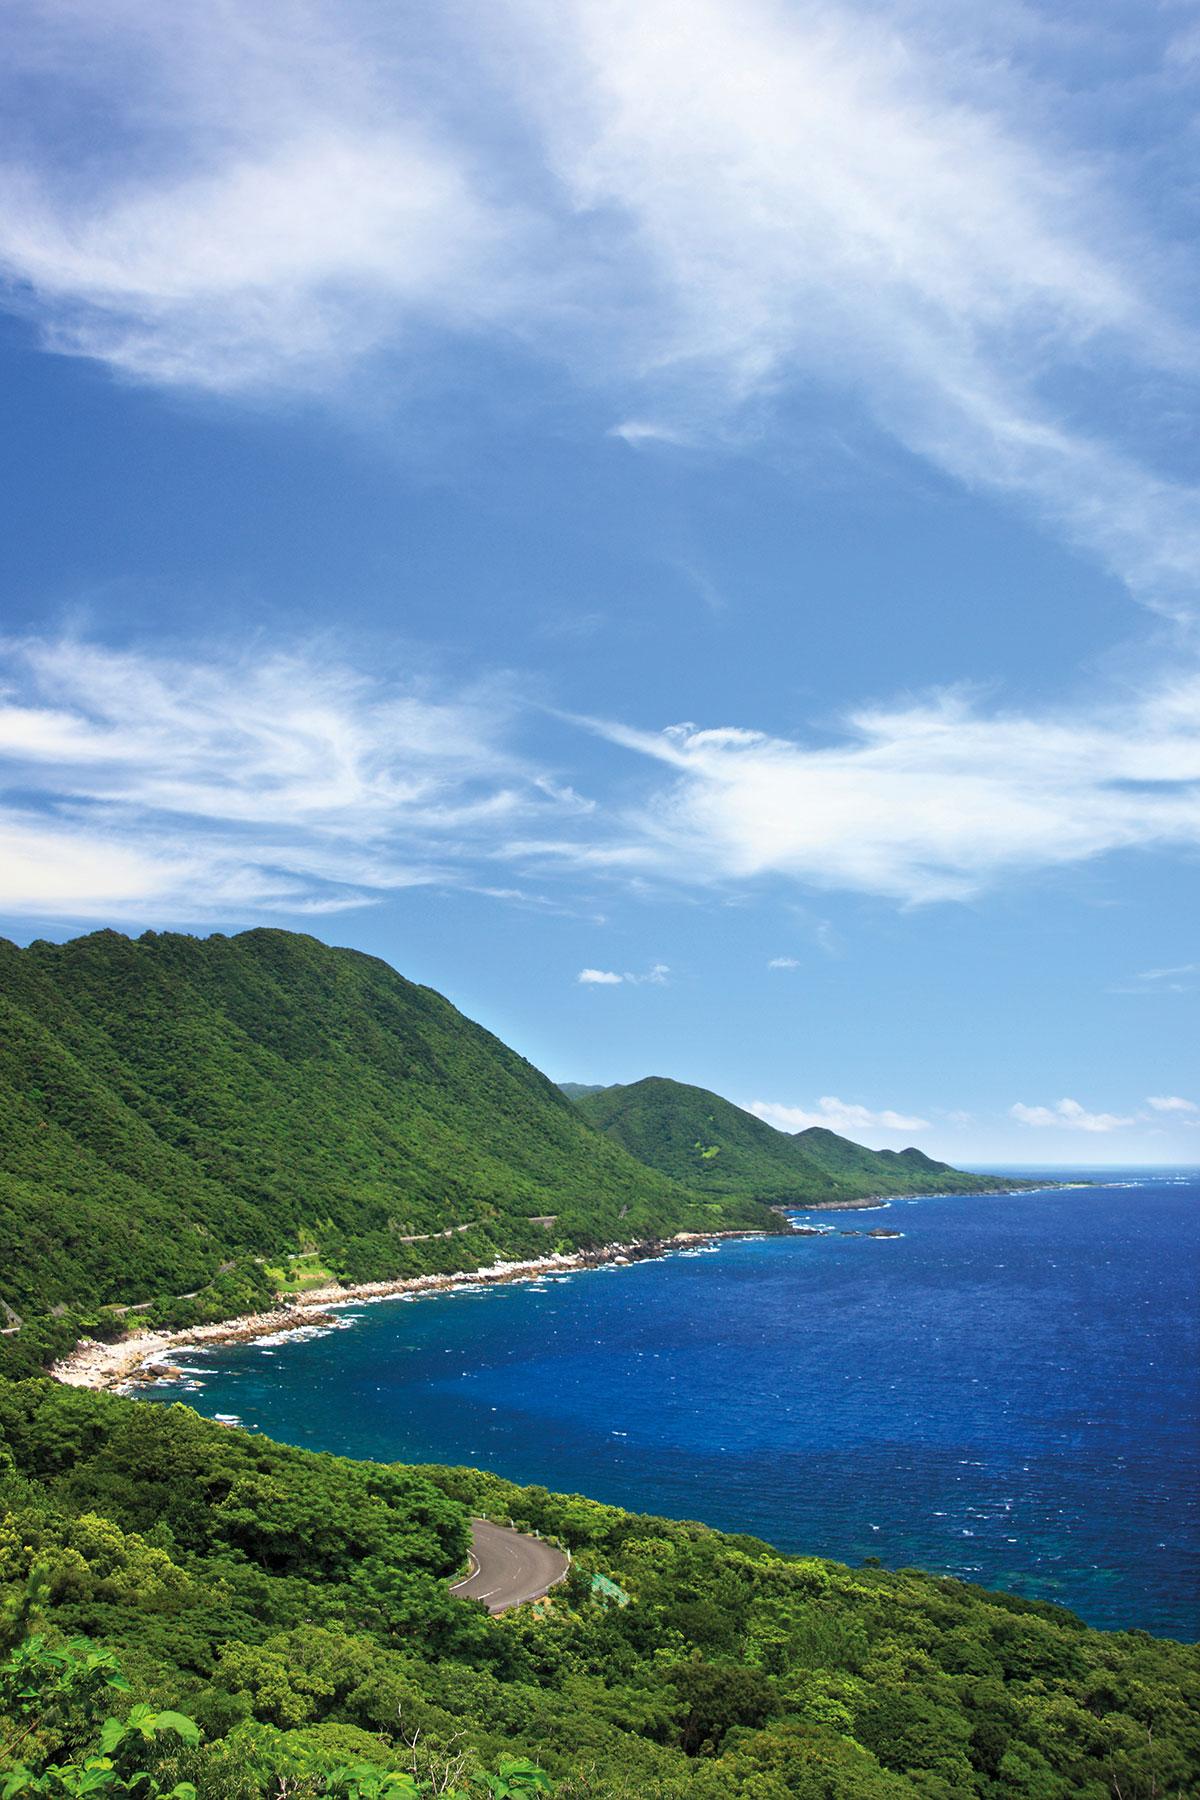 Yakushima, Kagoshima Prefecture, Japan